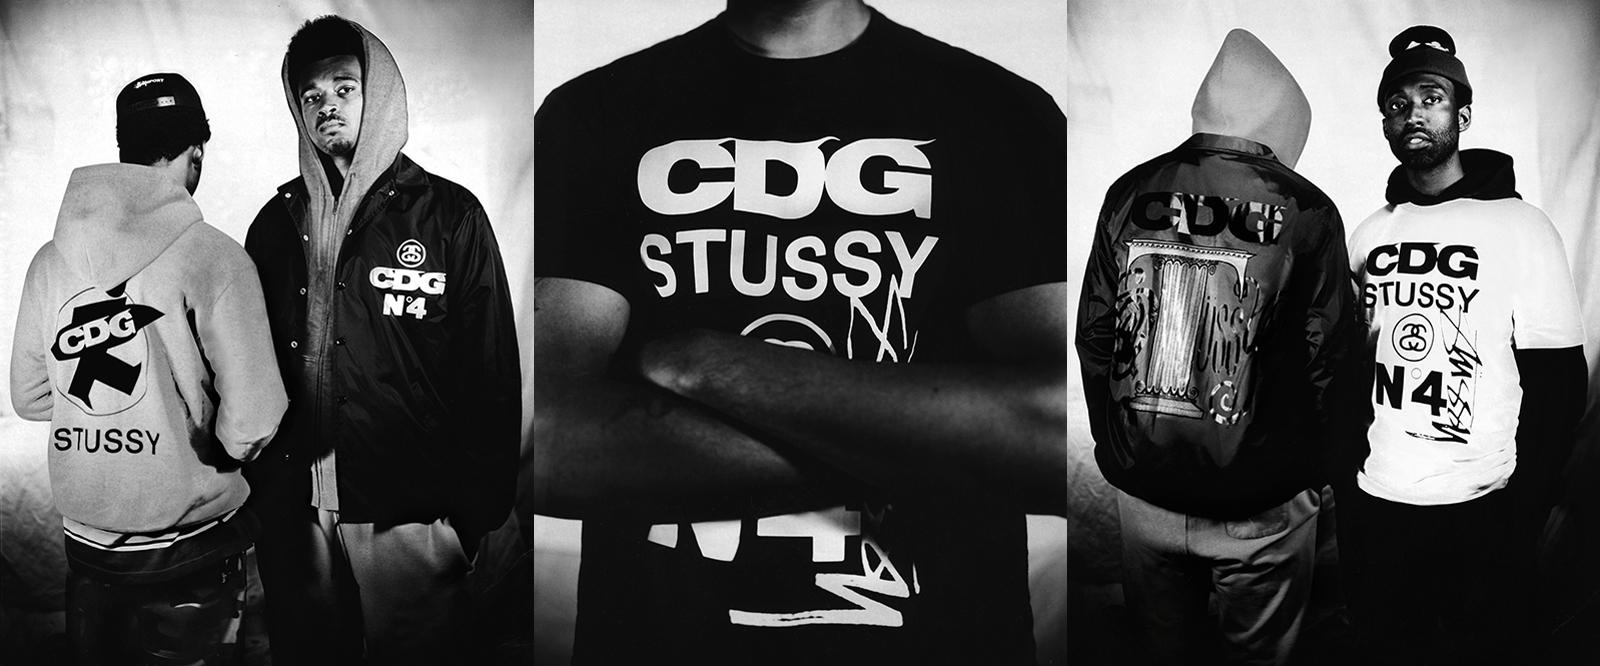 Stüssy & CDG